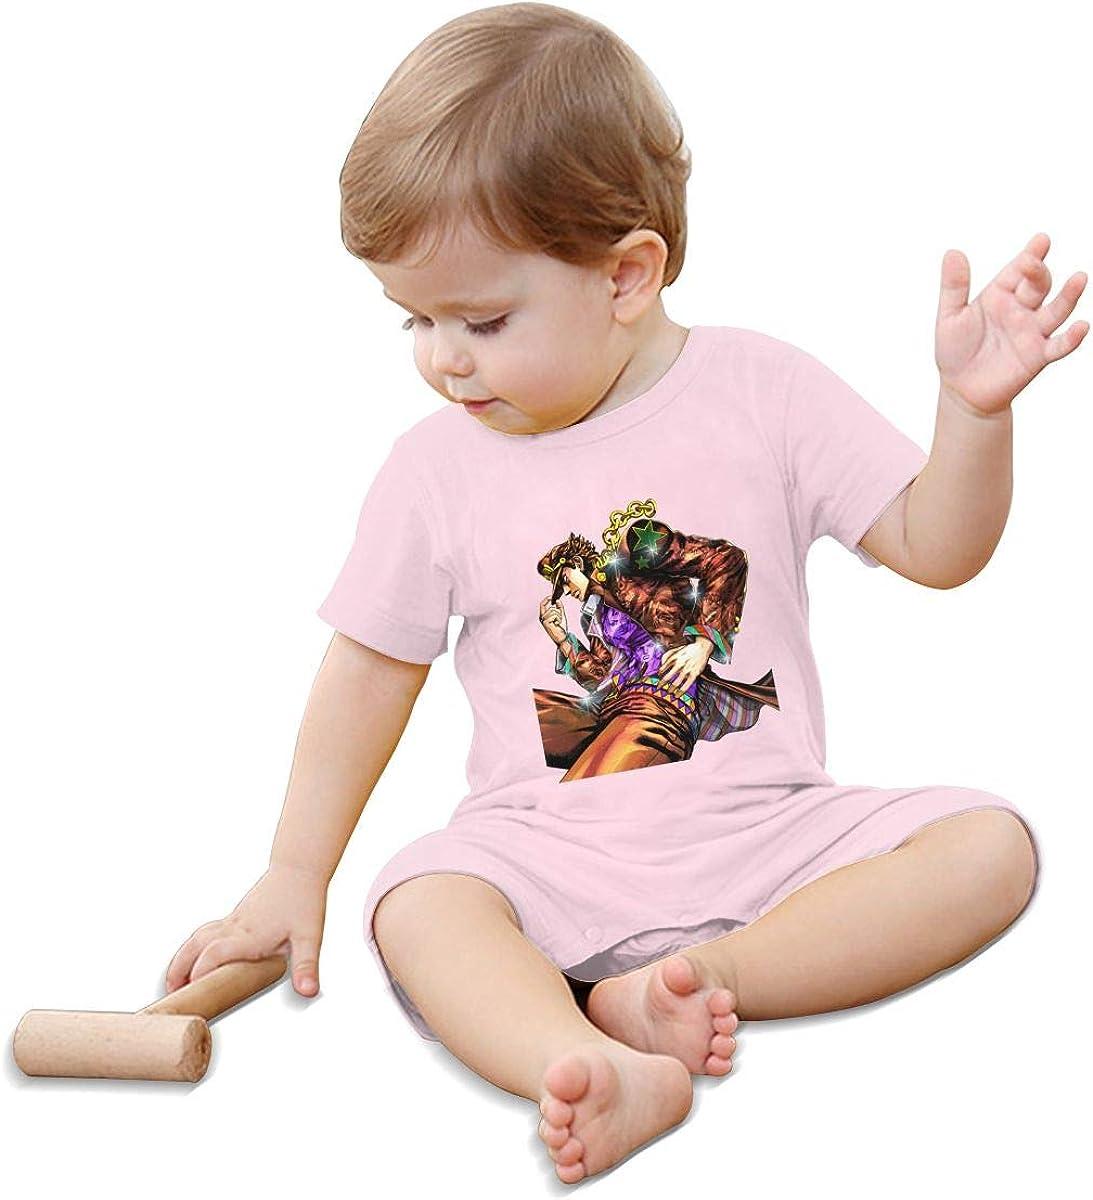 5husihai JoJos Bizarre Adventure 1-24 Months Boy Girl Baby Short Sleeve Creeper Jumpsuit Pink